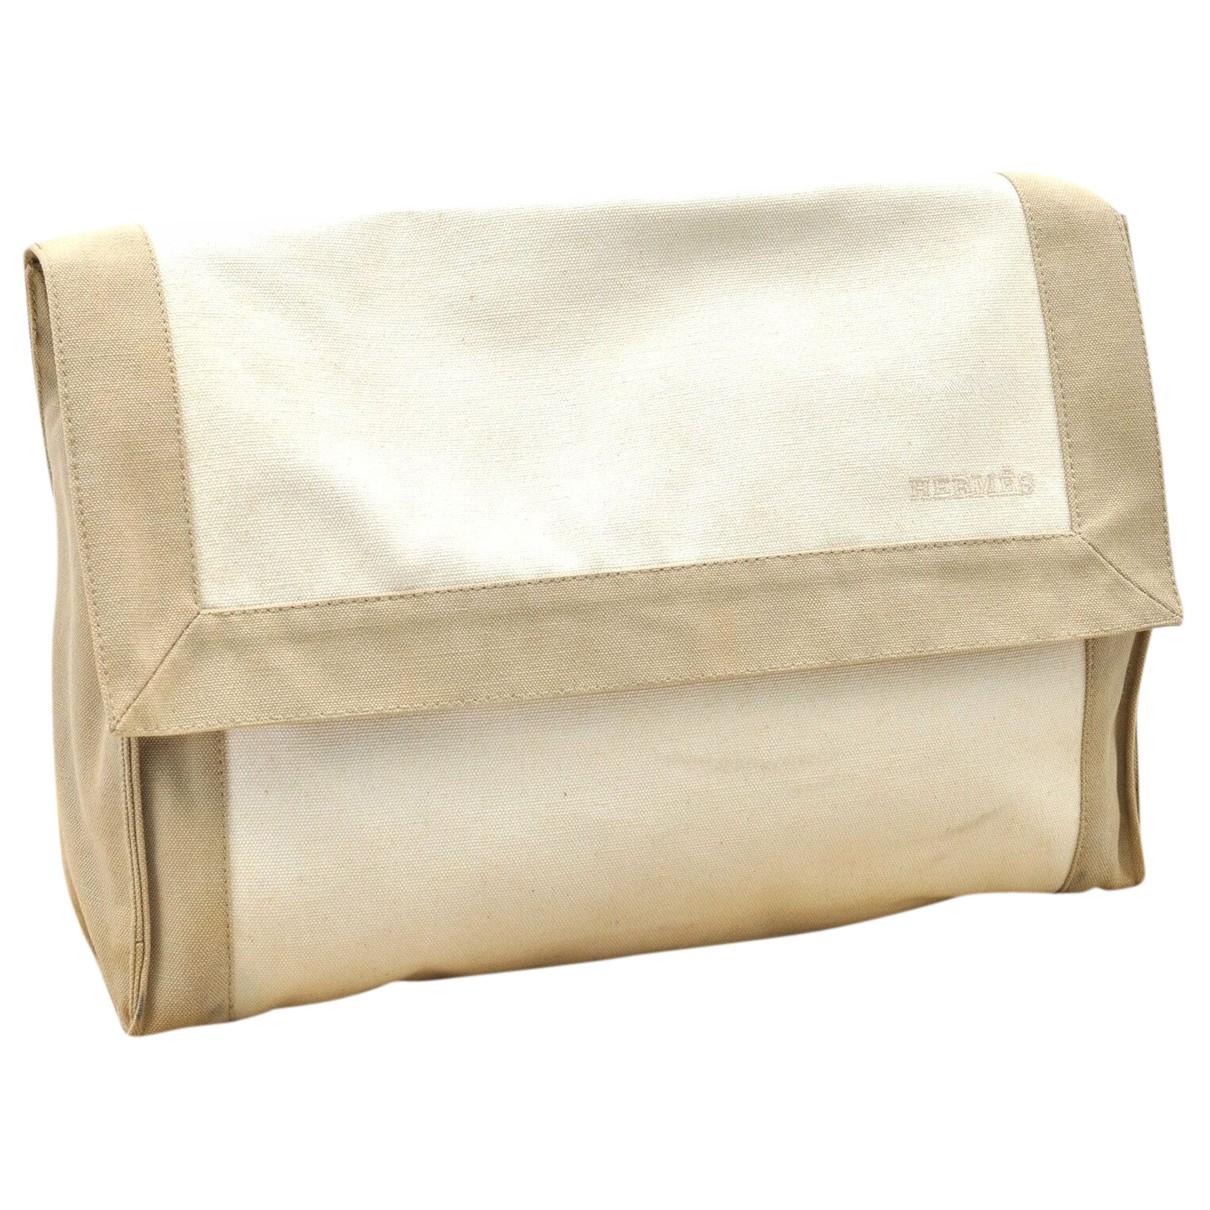 Hermès N Beige Cloth Clutch bag for Women N